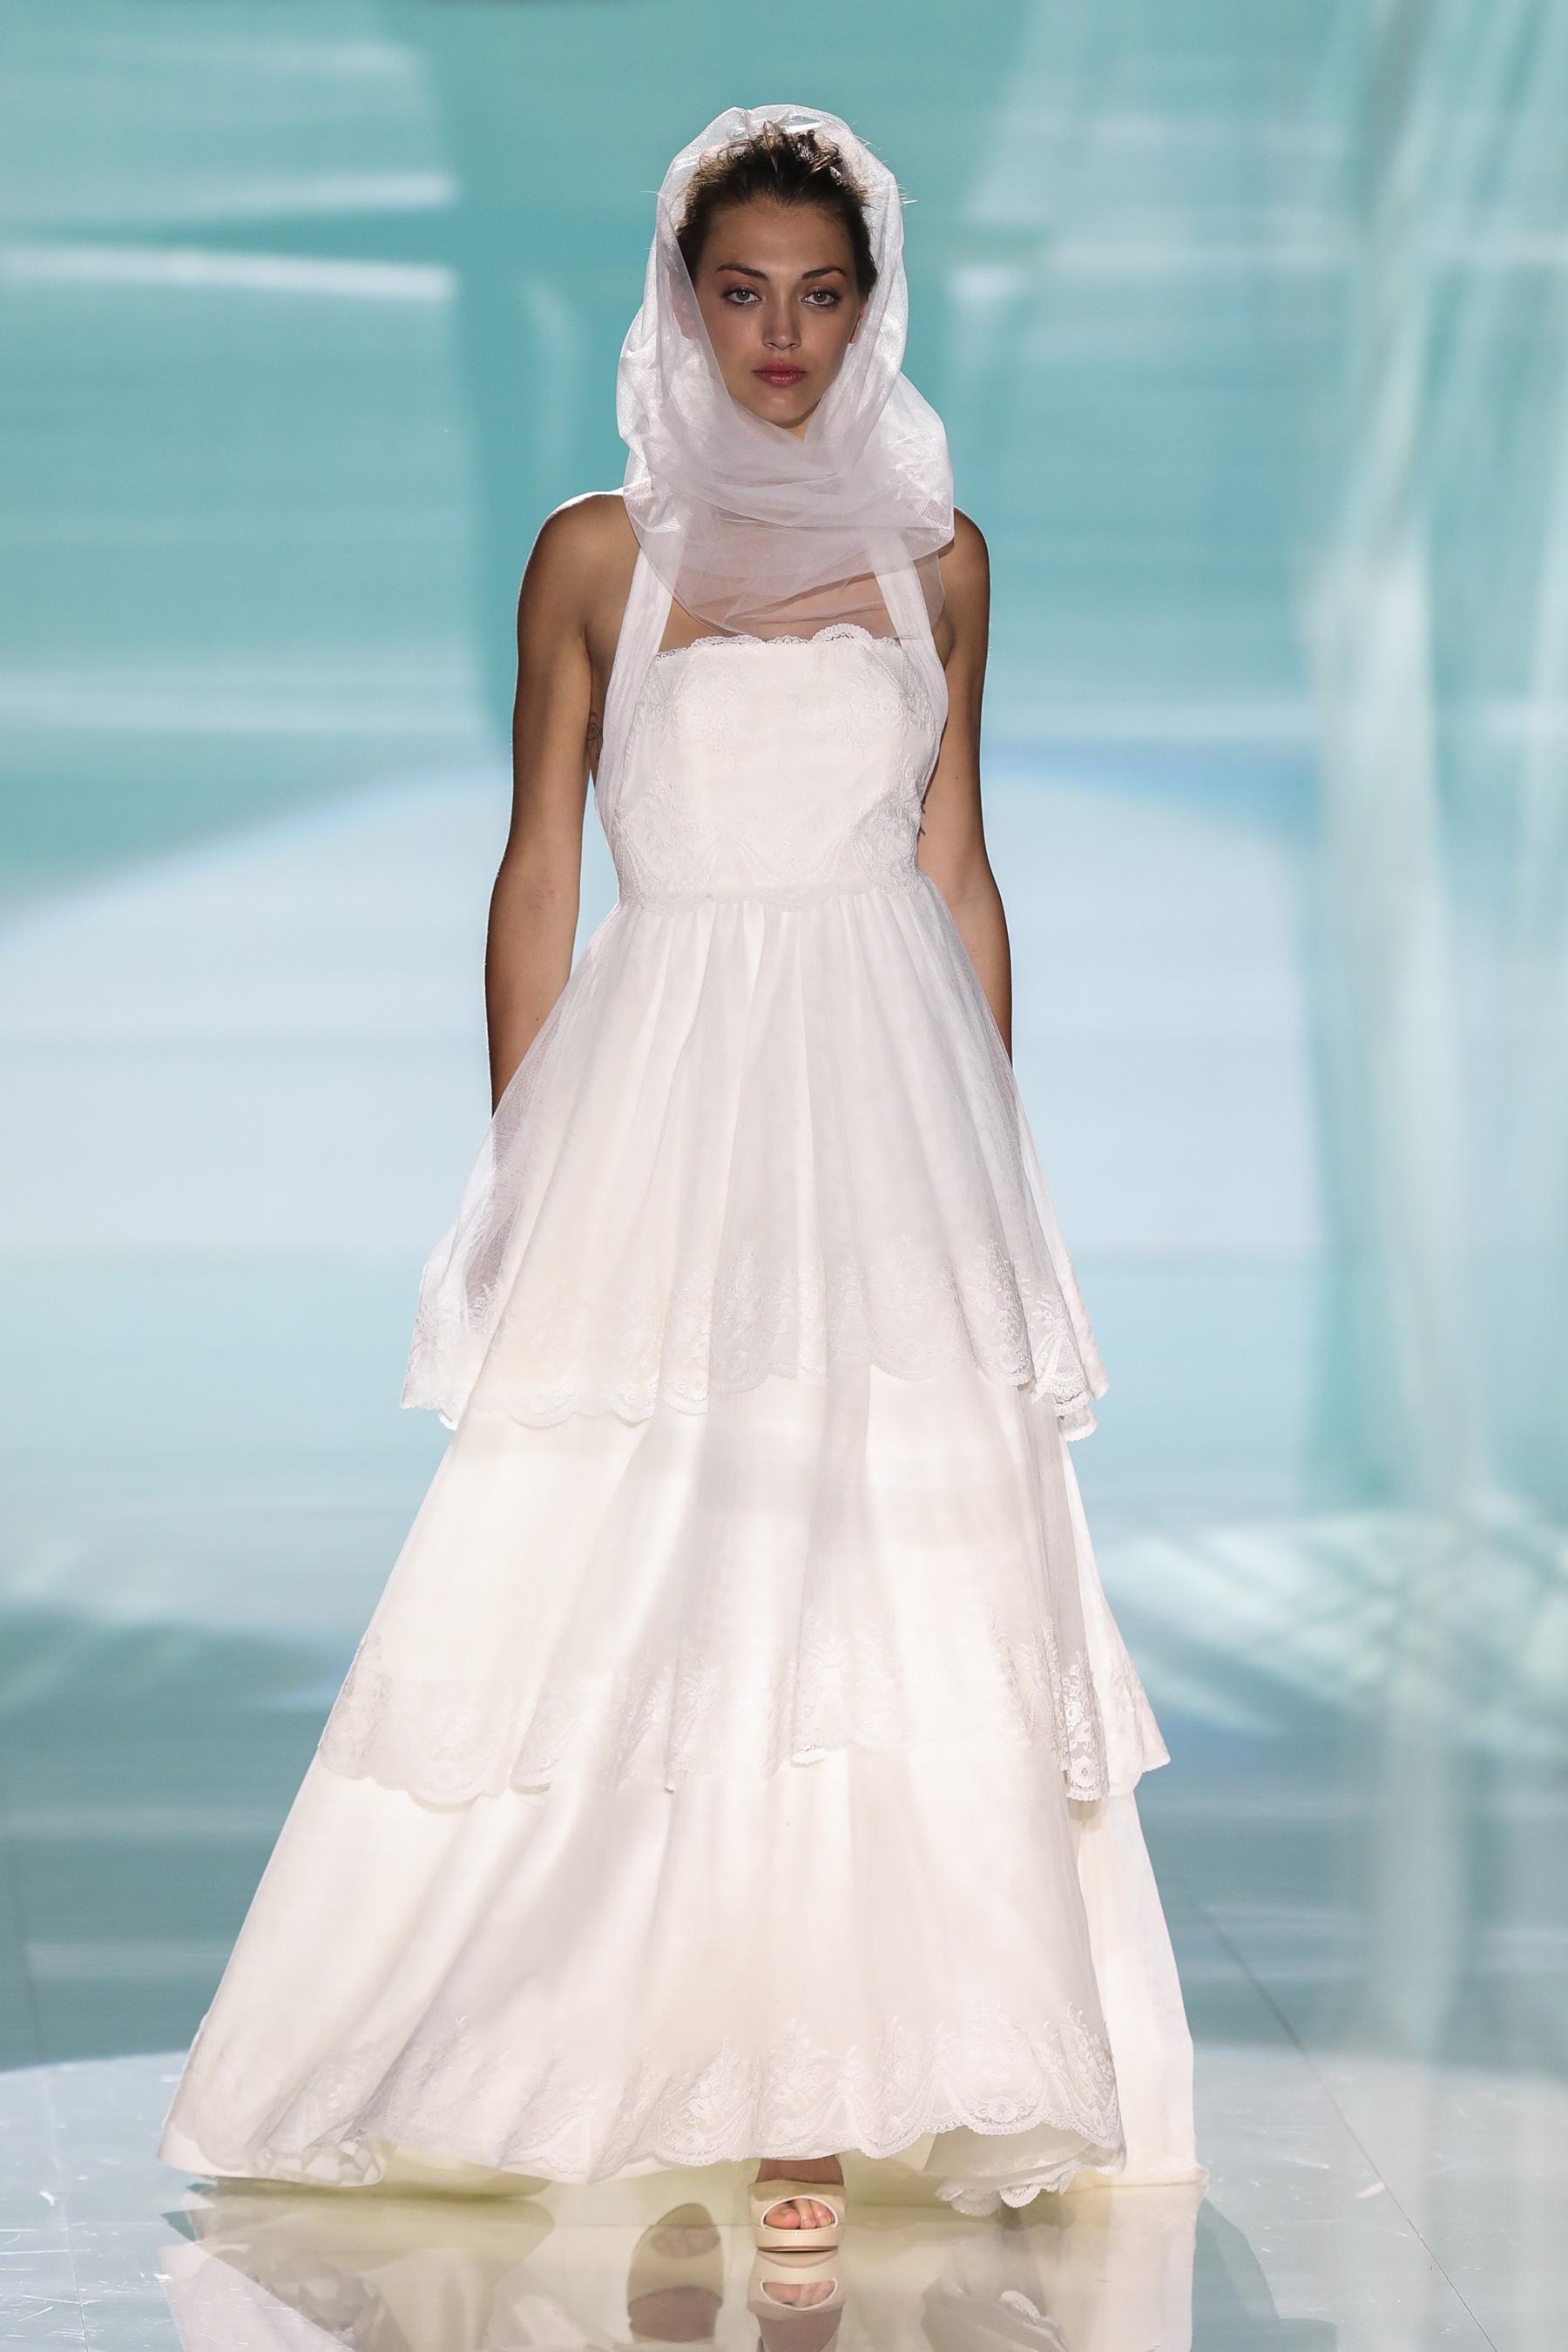 Neus Bermejo - Female Fashion Models - Bellazon